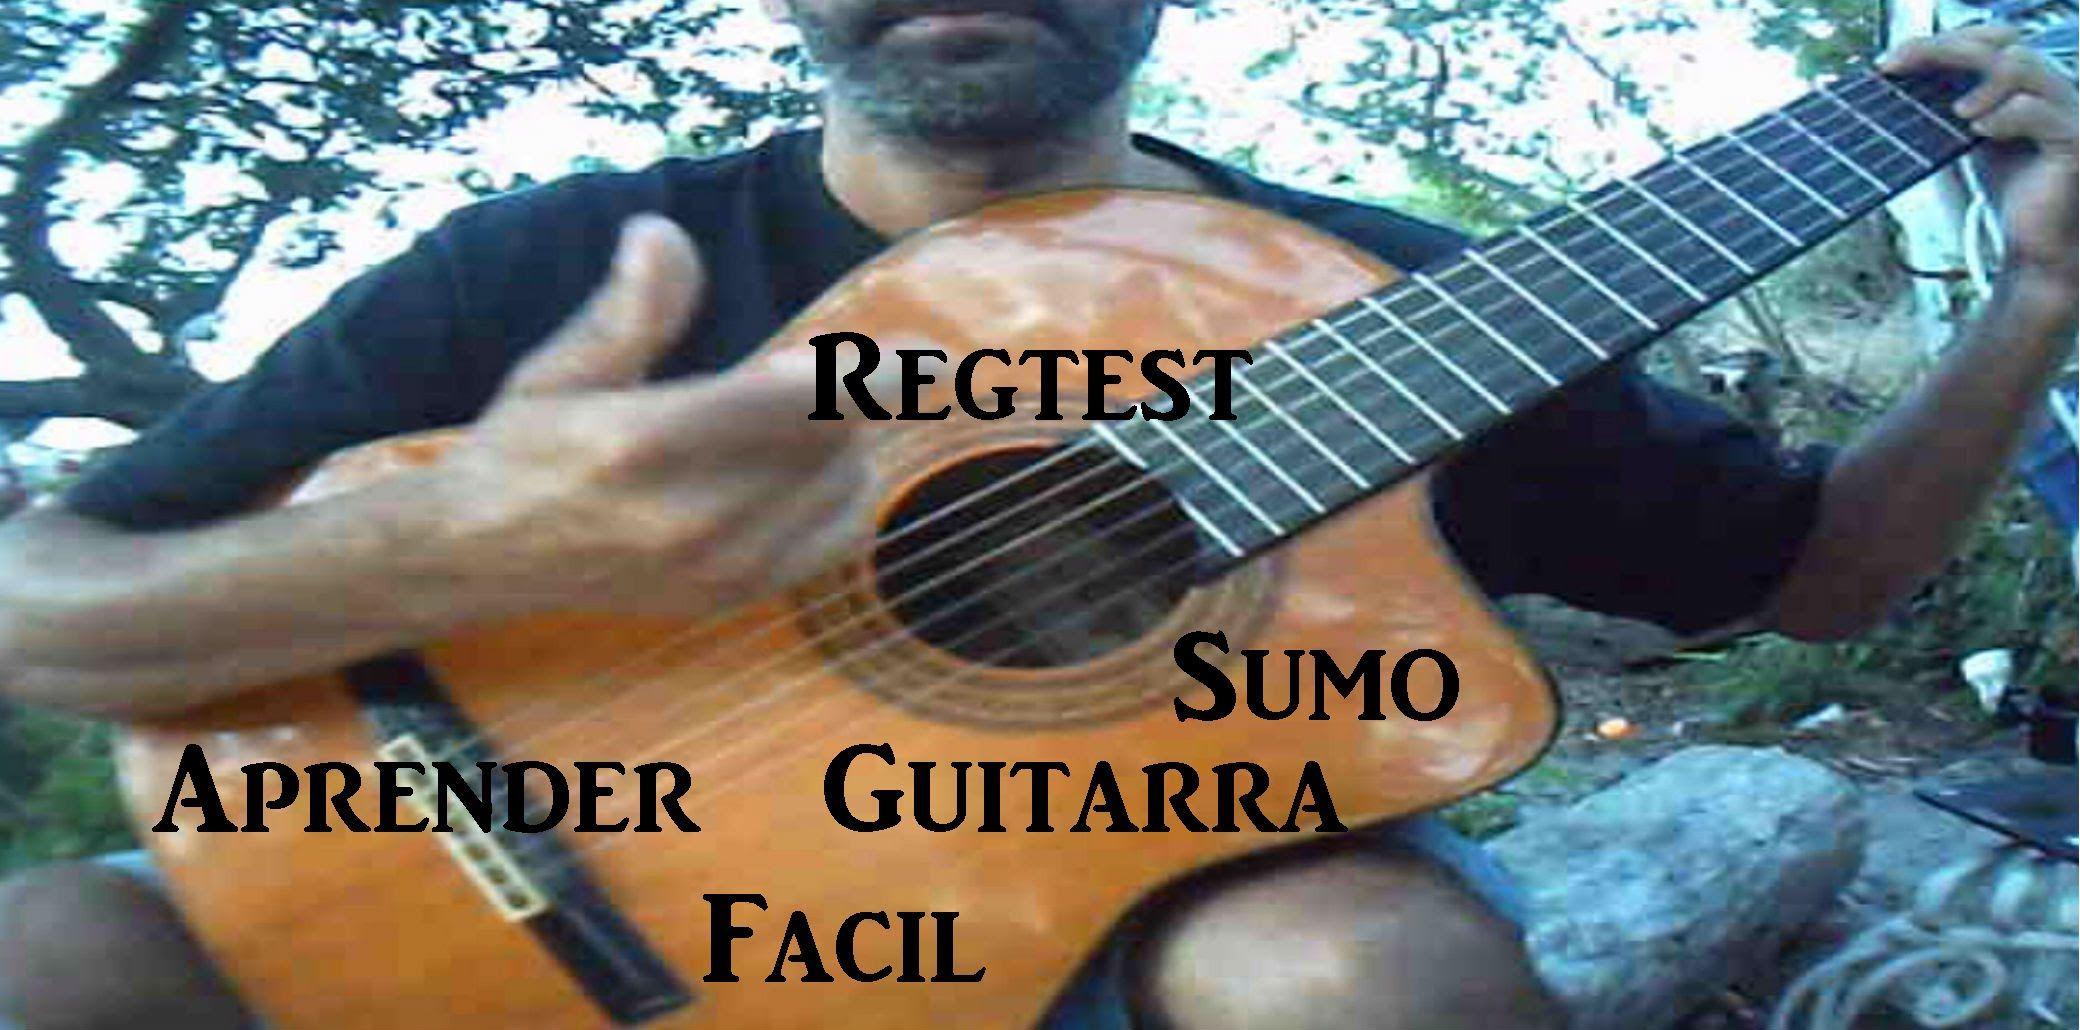 Aprender Guitarra Regtest Sumo